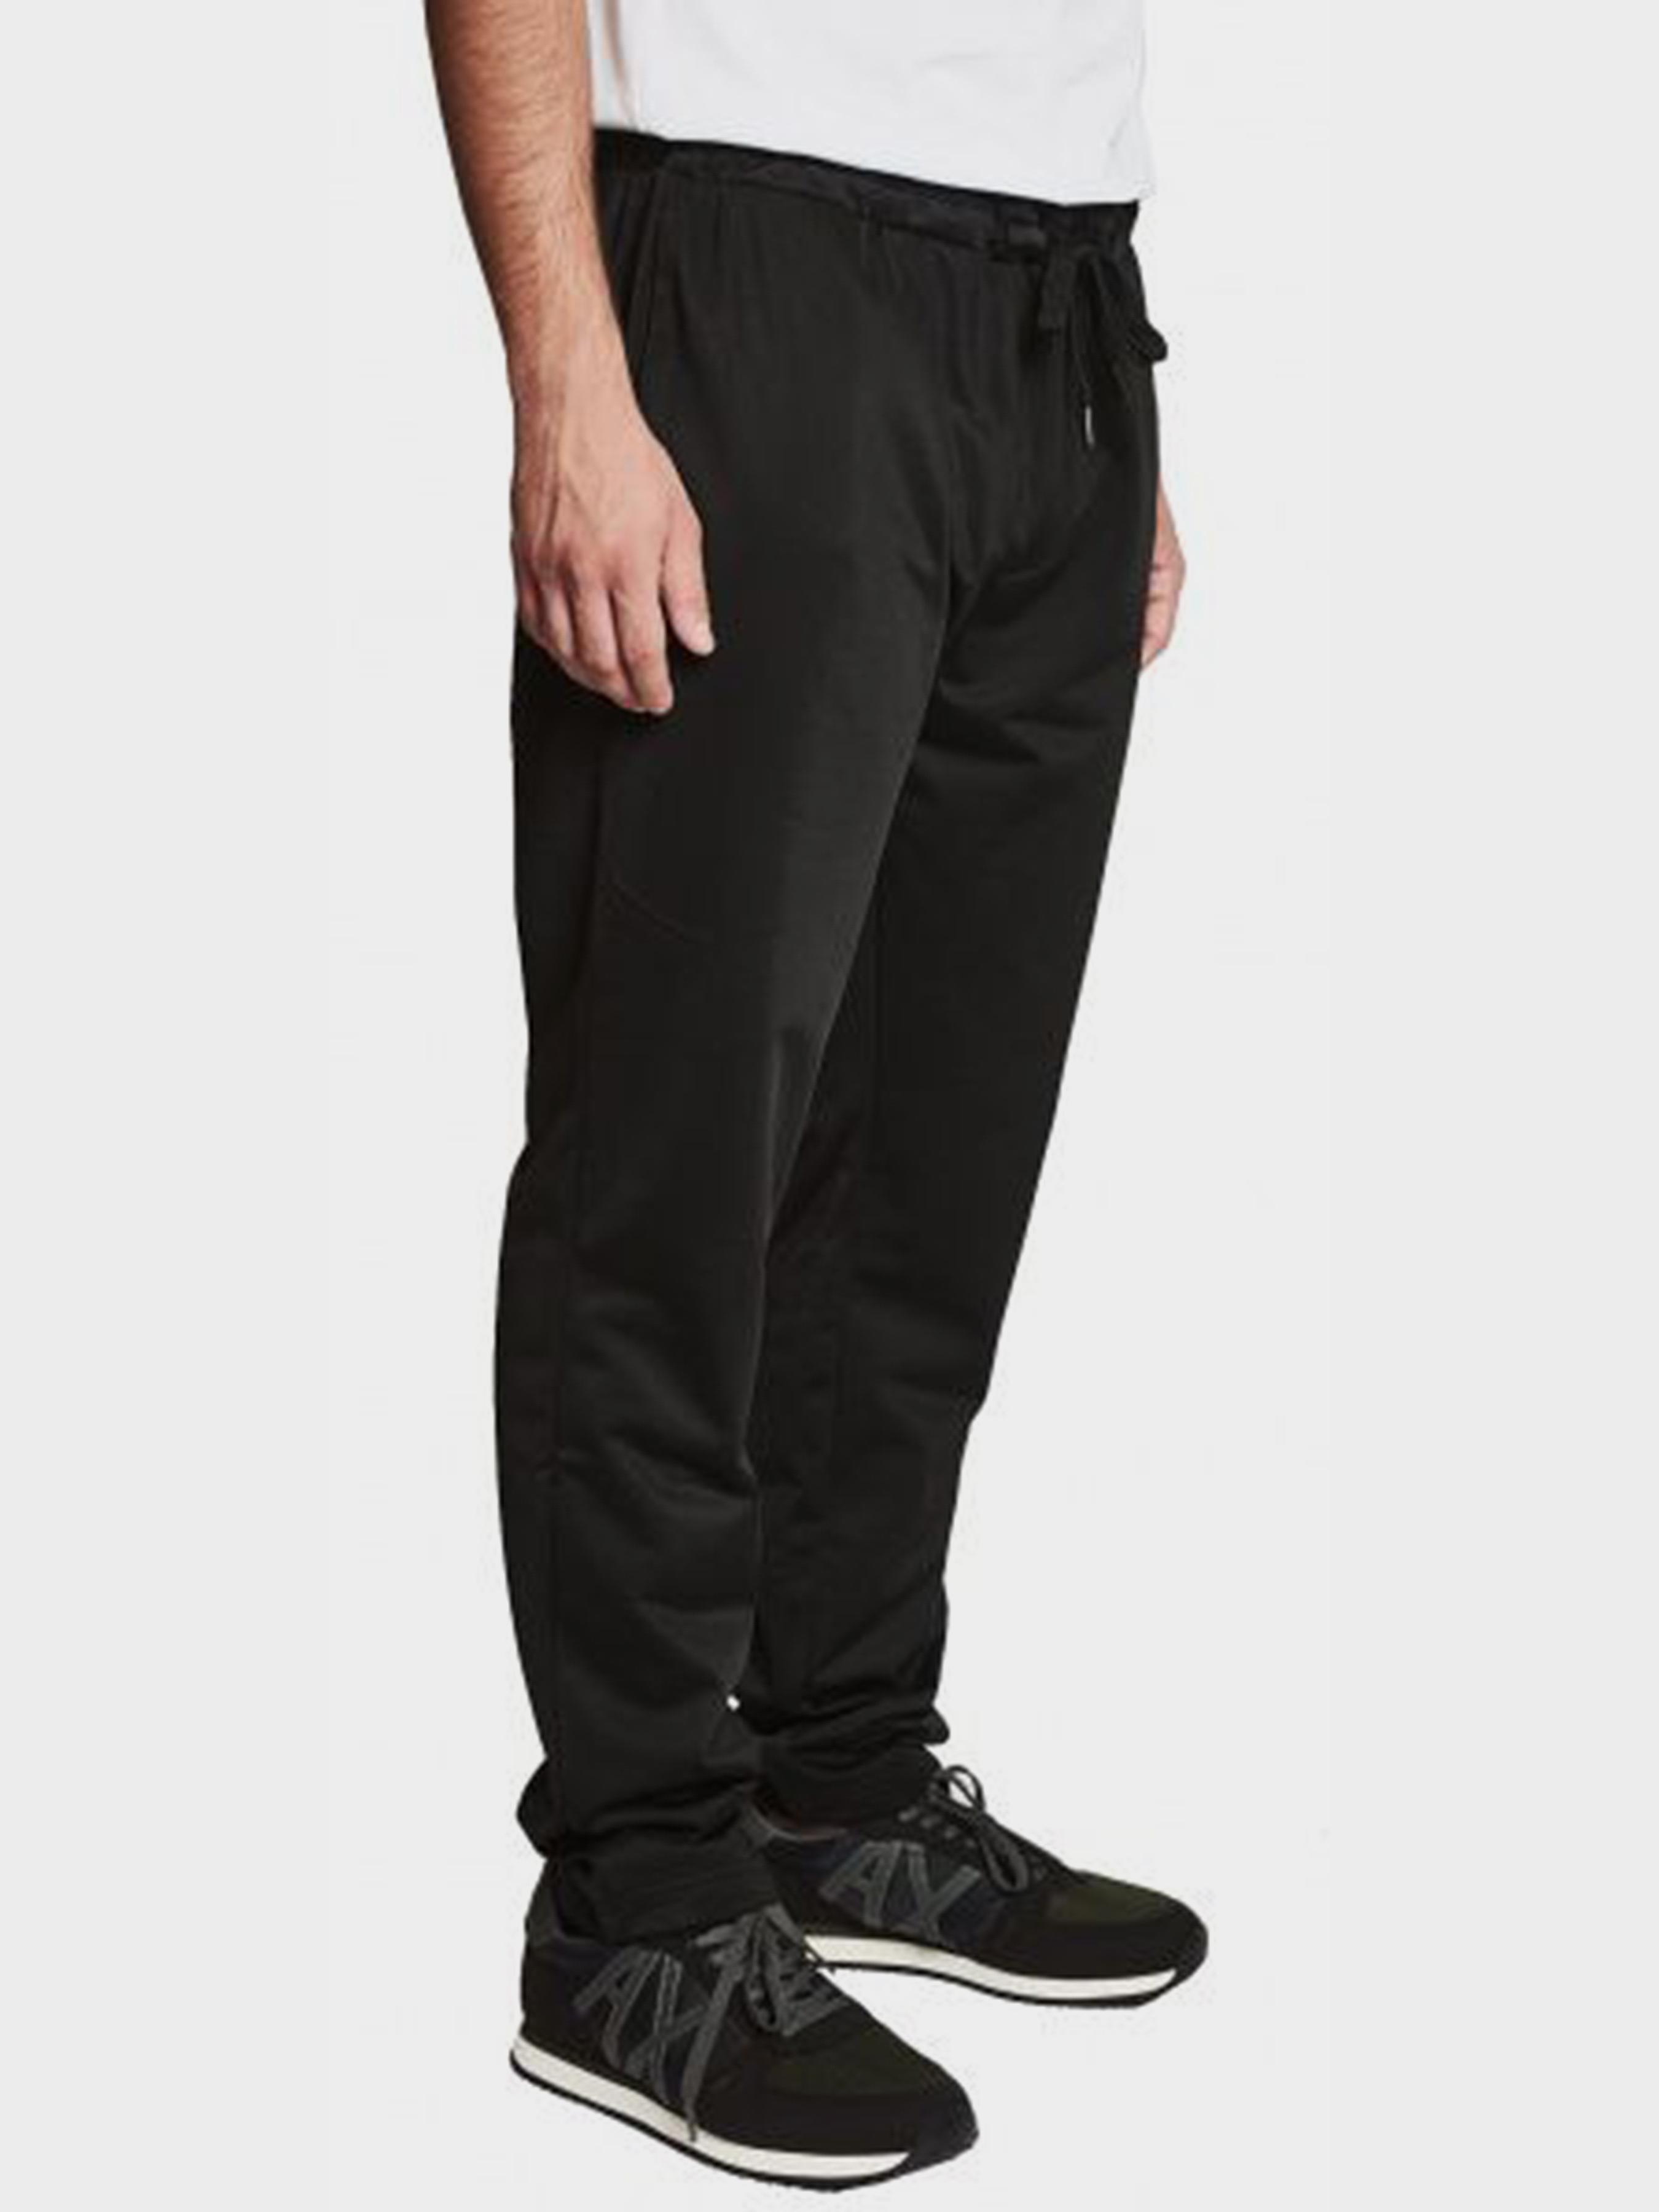 Armani Exchange Брюки мужские модель WH1905 отзывы, 2017